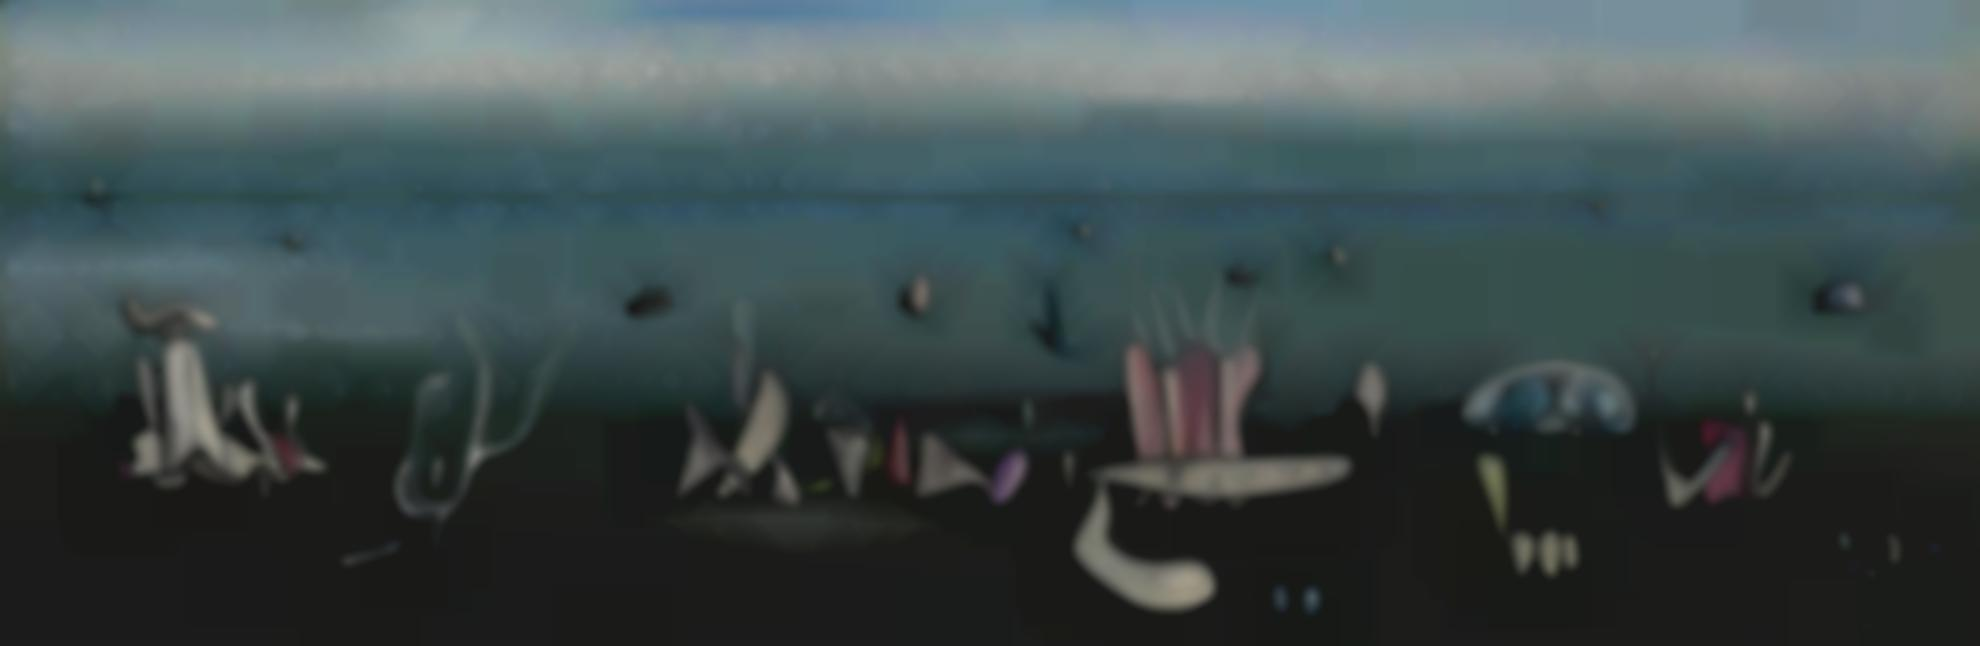 Yves Tanguy-Sans Titre-1934